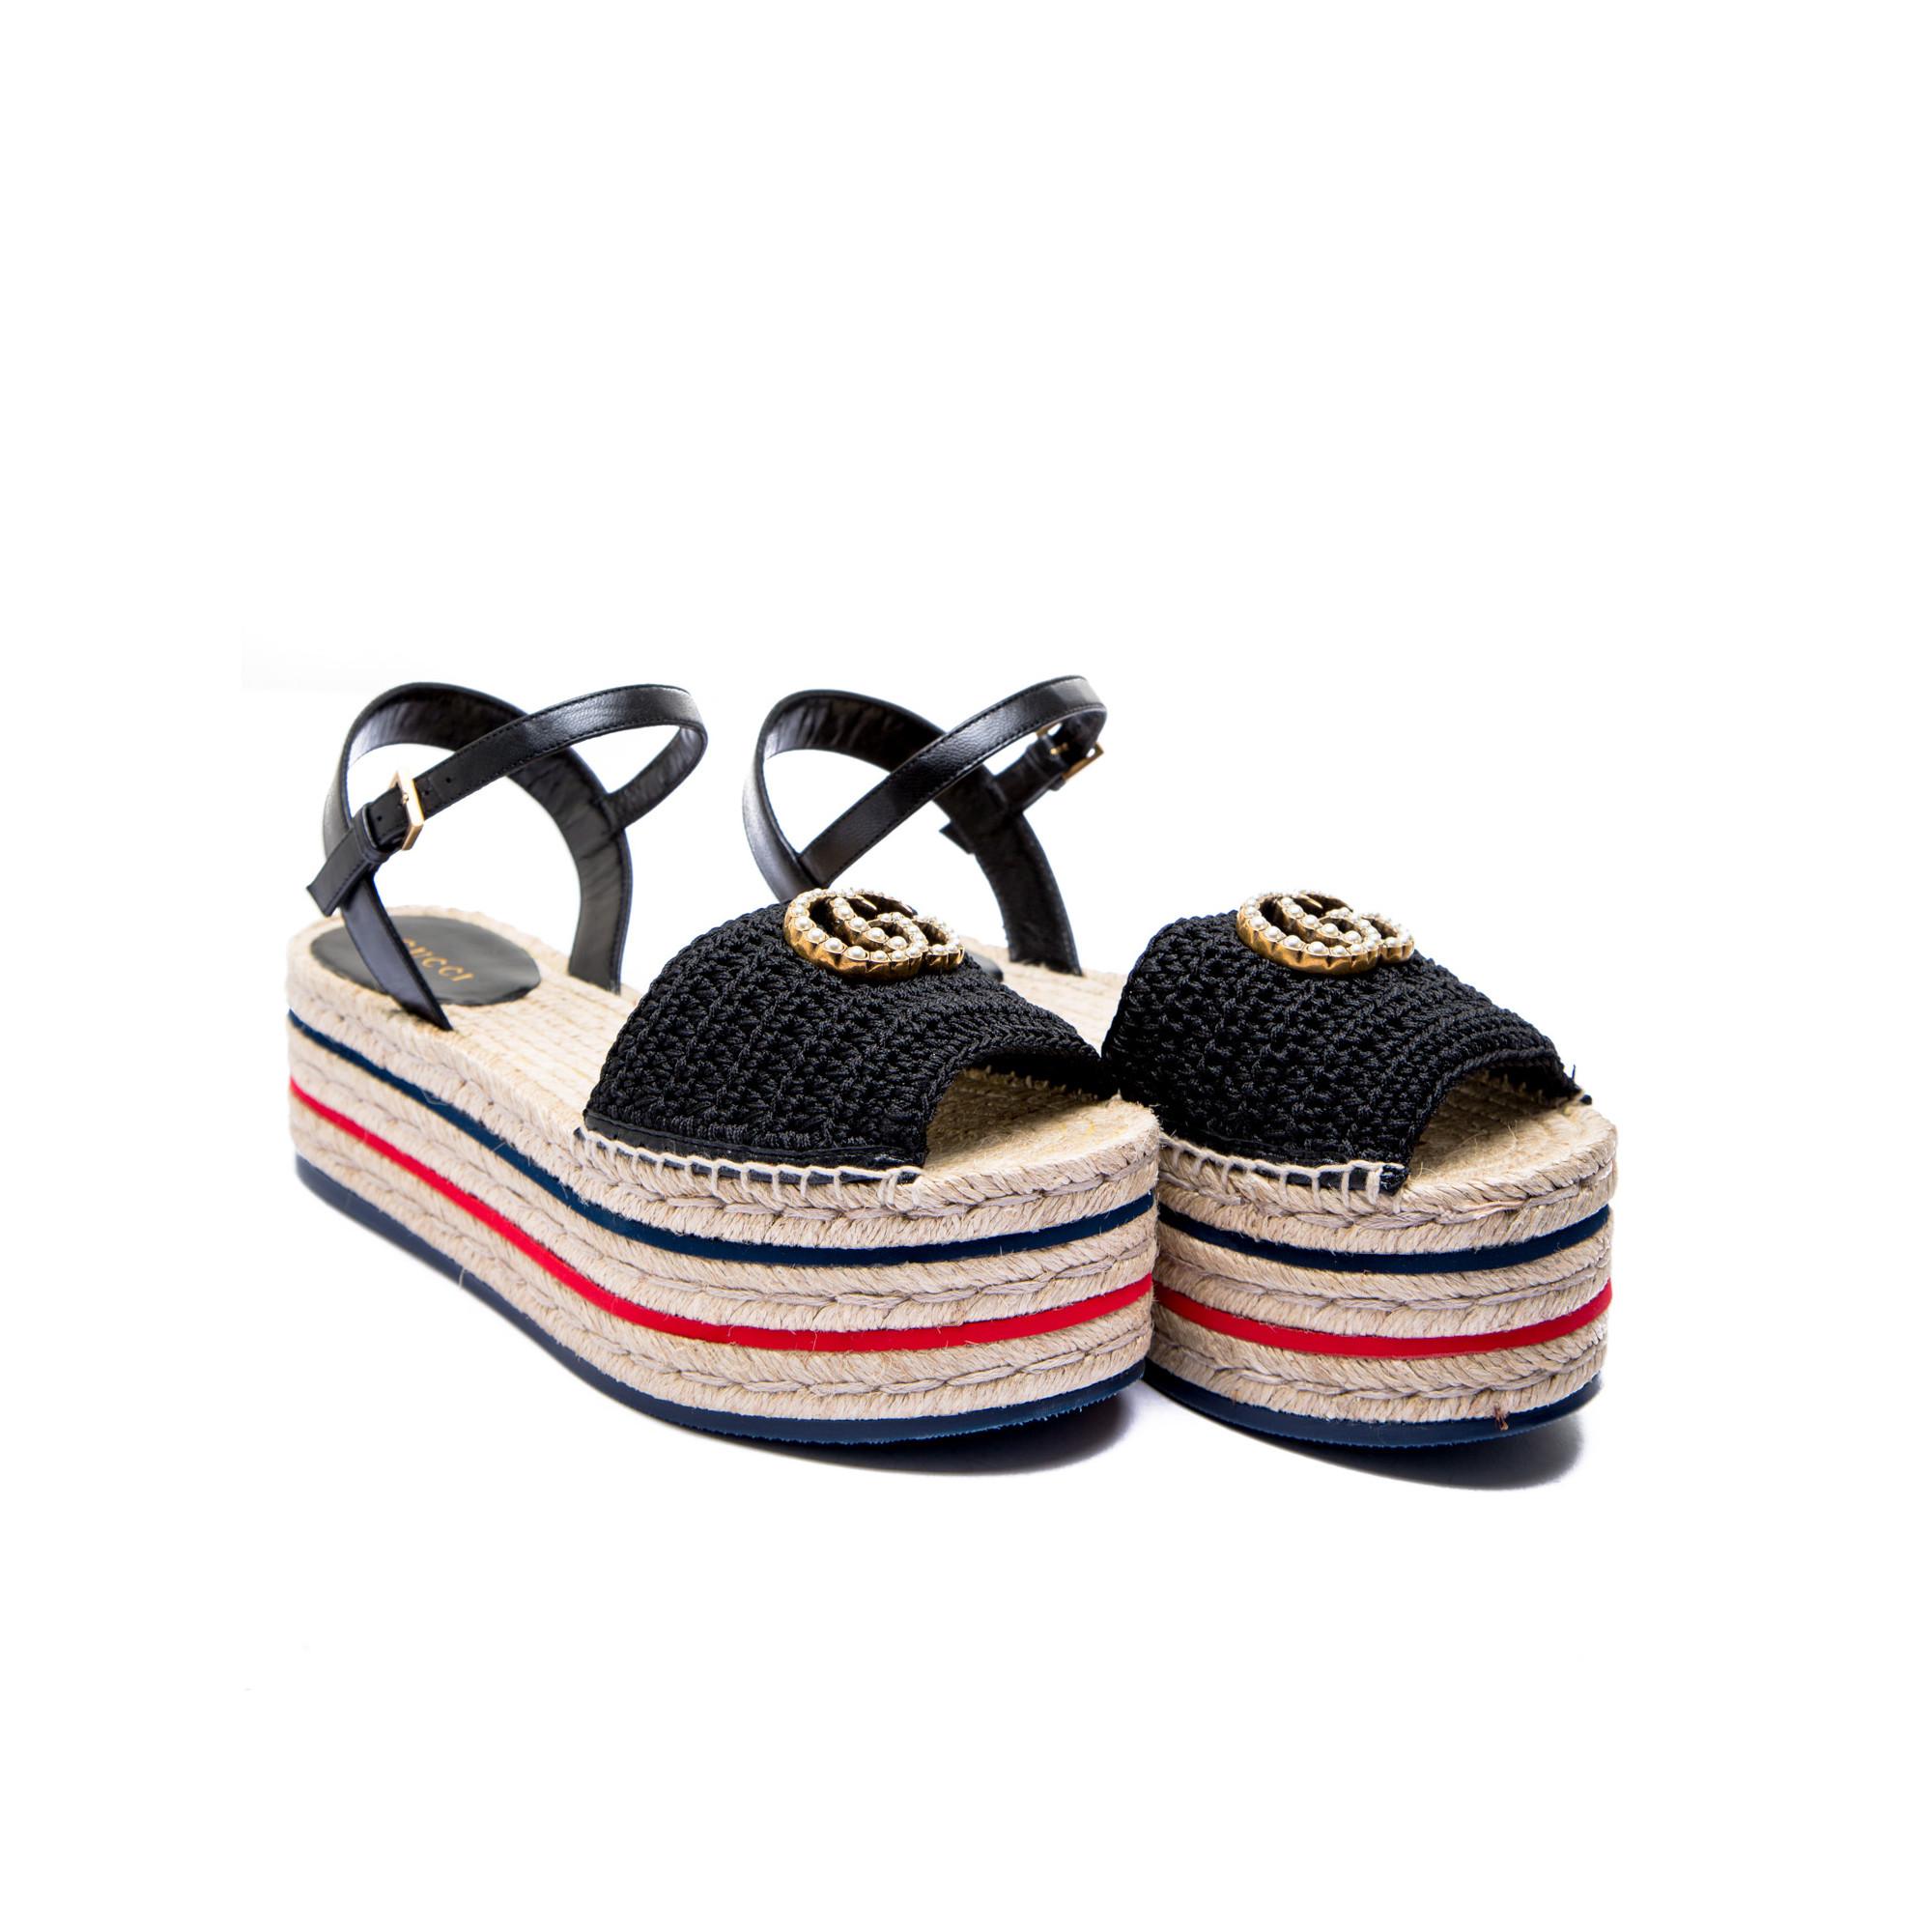 aa1ff108f ... Gucci sandals crochet black Gucci sandals crochet black - www. derodeloper.com - Derodeloper ...